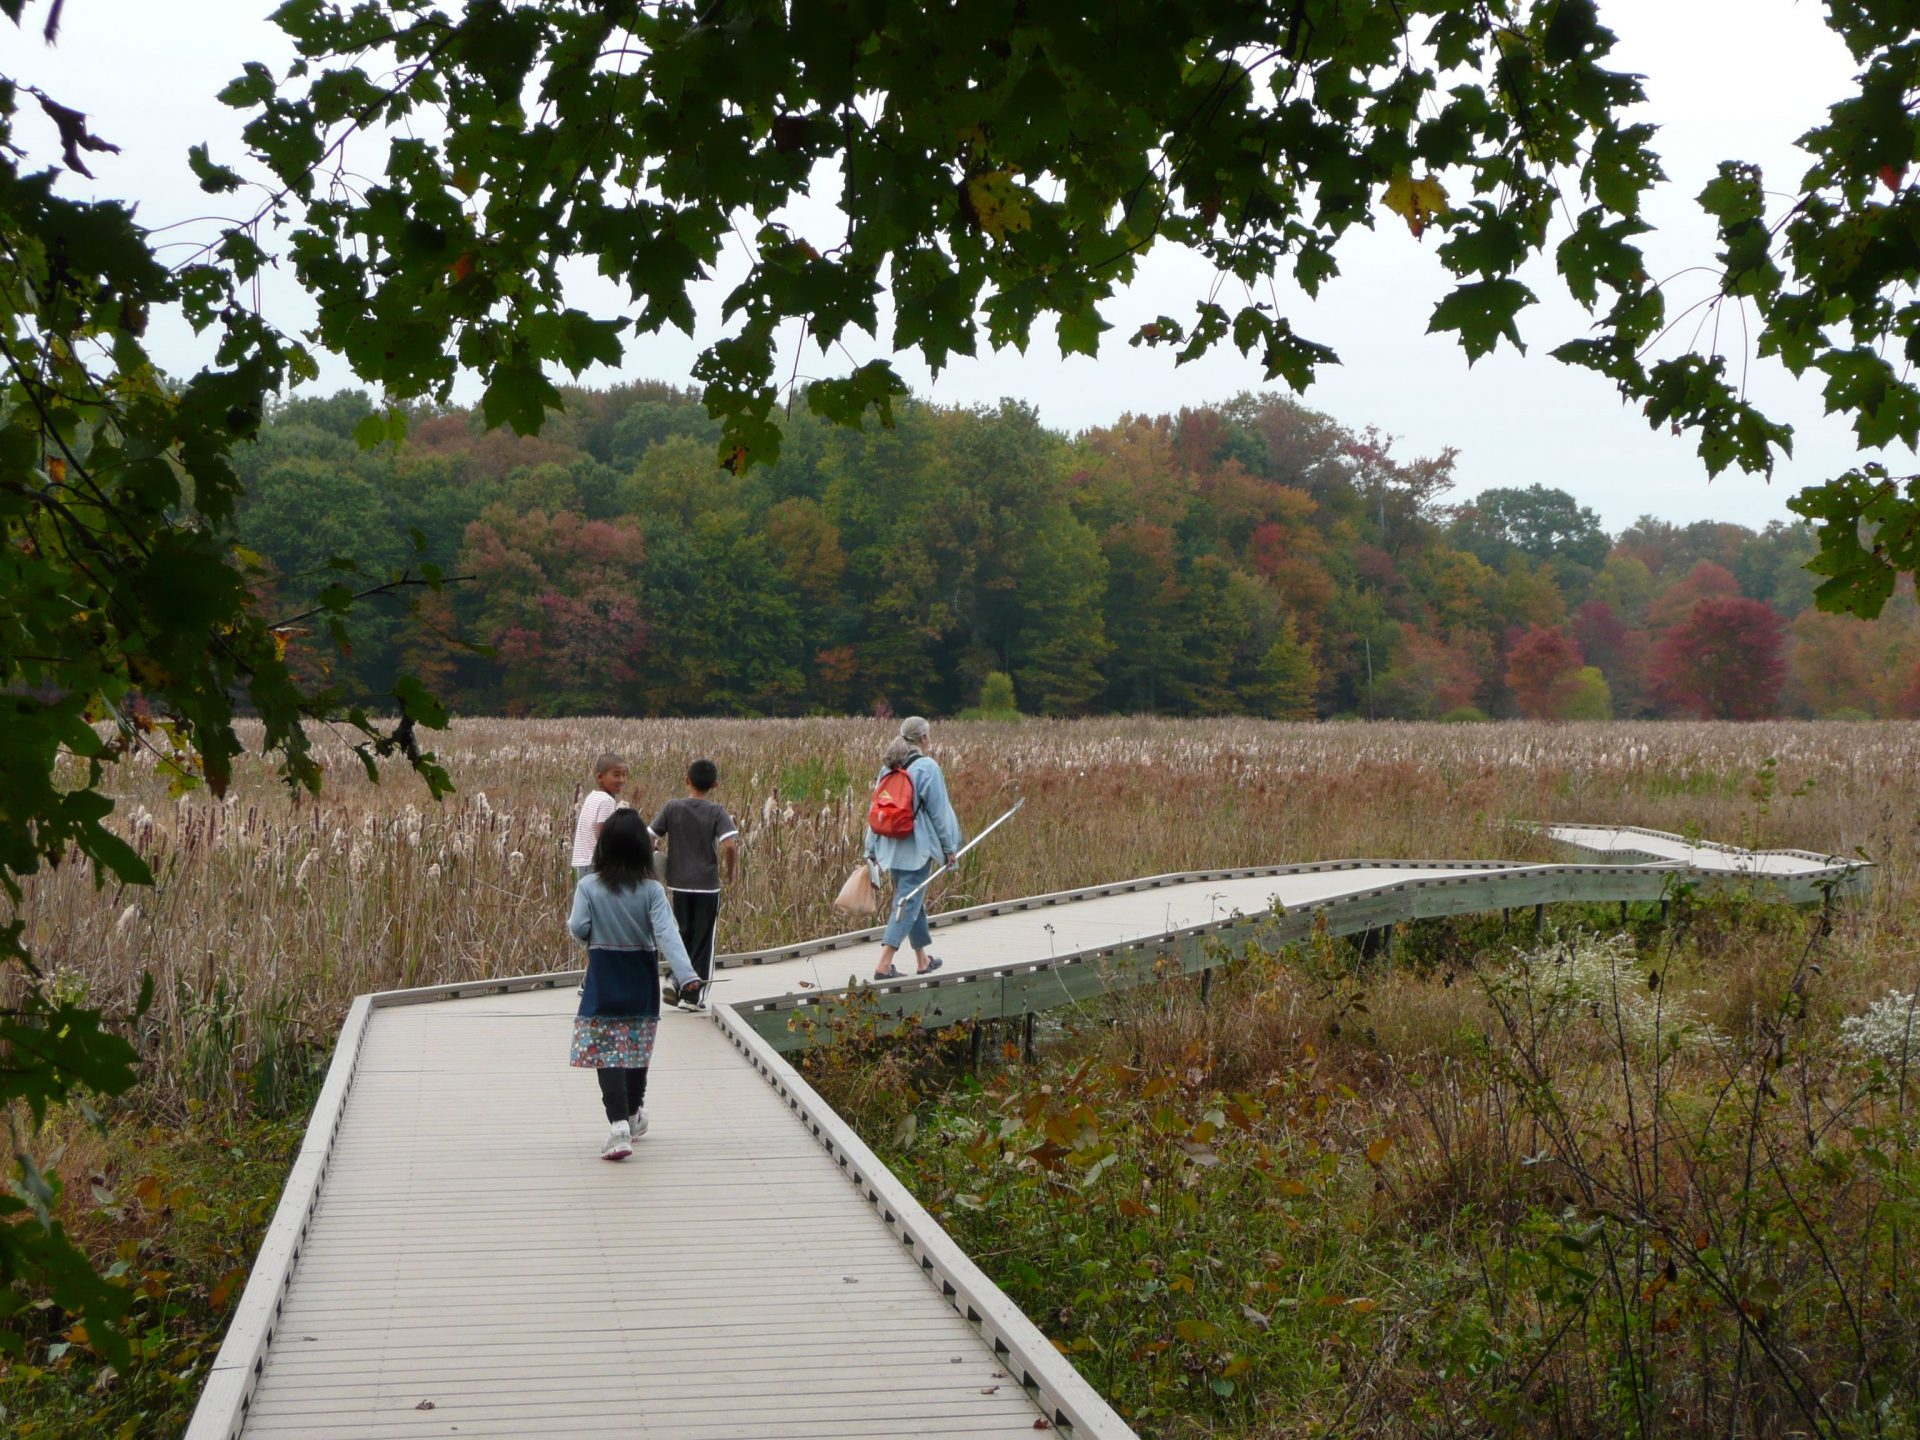 Woman and kids walking on wood boardwalk over wetland